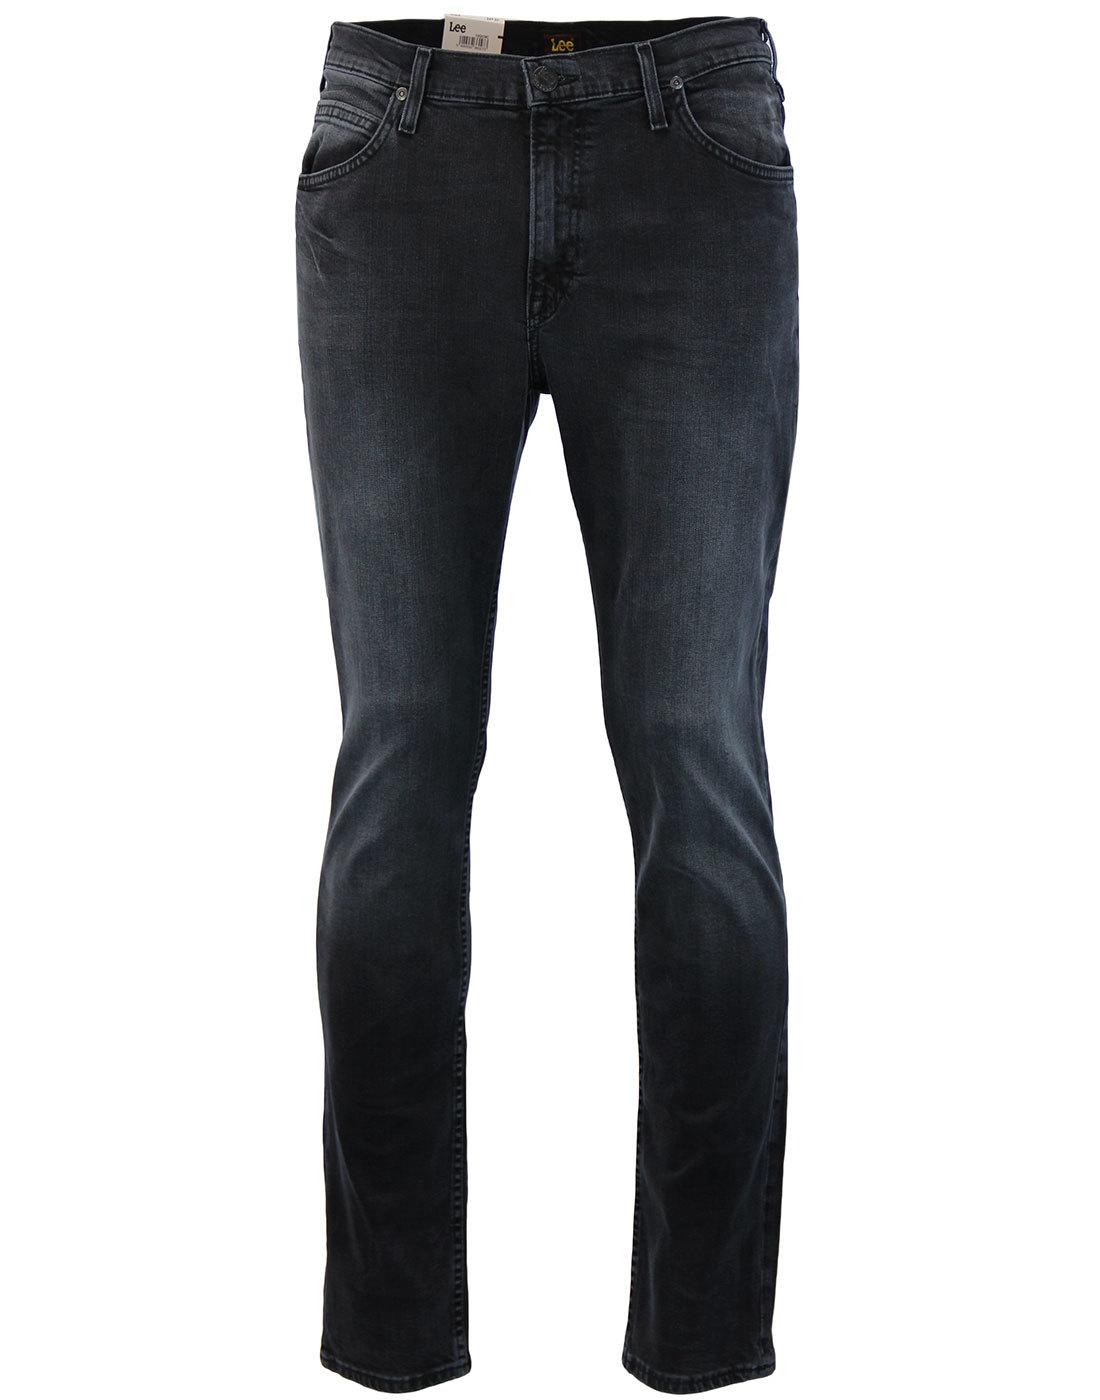 Rider LEE Retro Slim Leg Dark Raven Denim Jeans